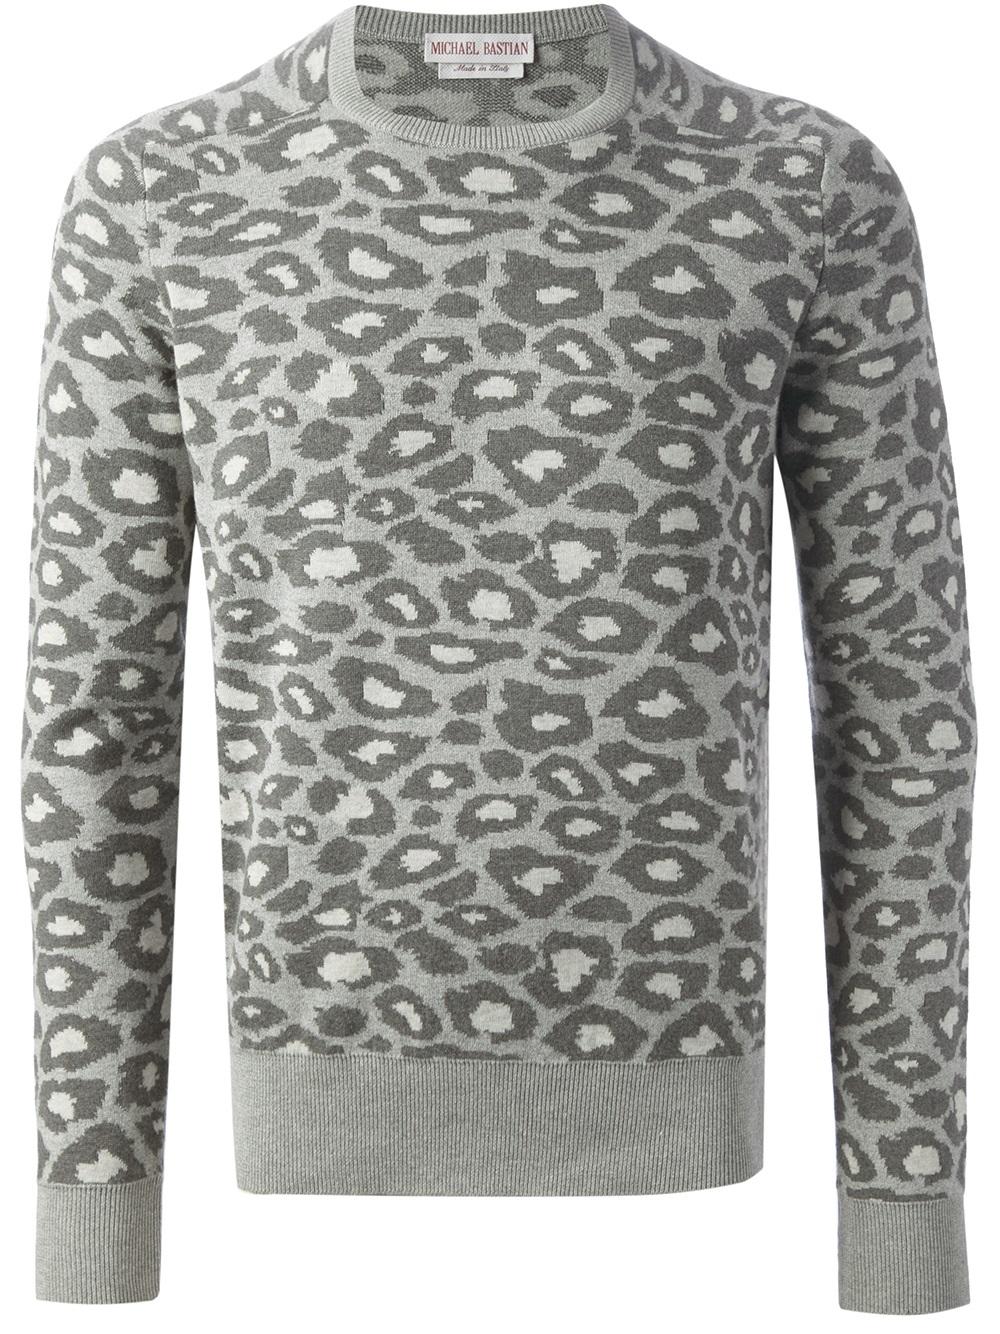 Michael bastian Leopard Print Sweater in Gray for Men   Lyst